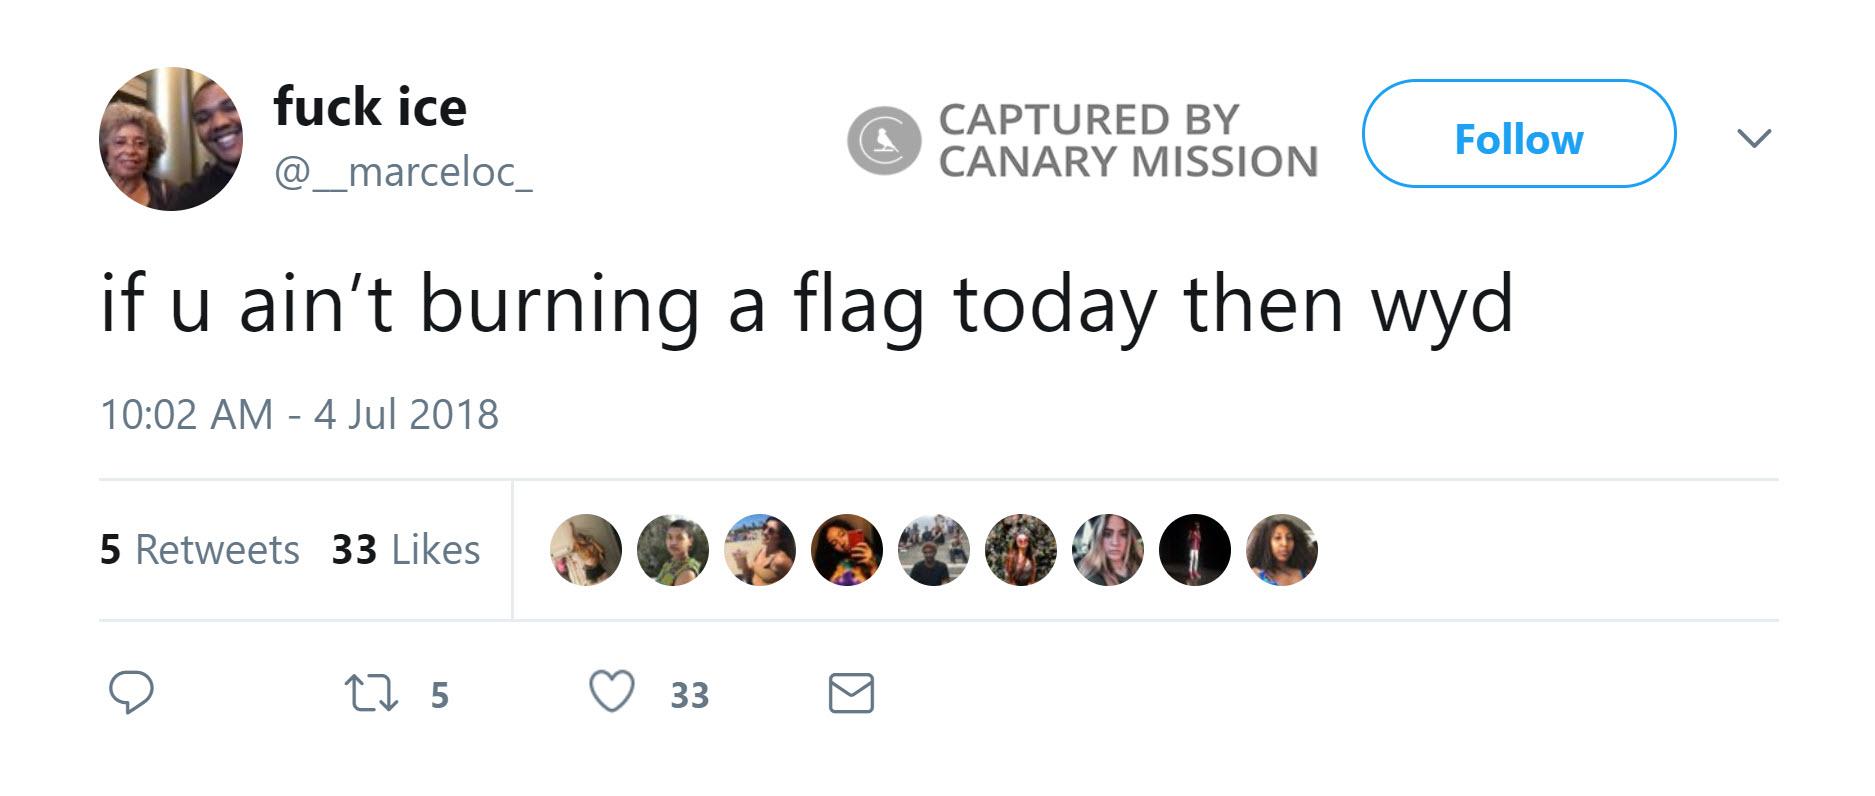 UCLA - Canary Mission